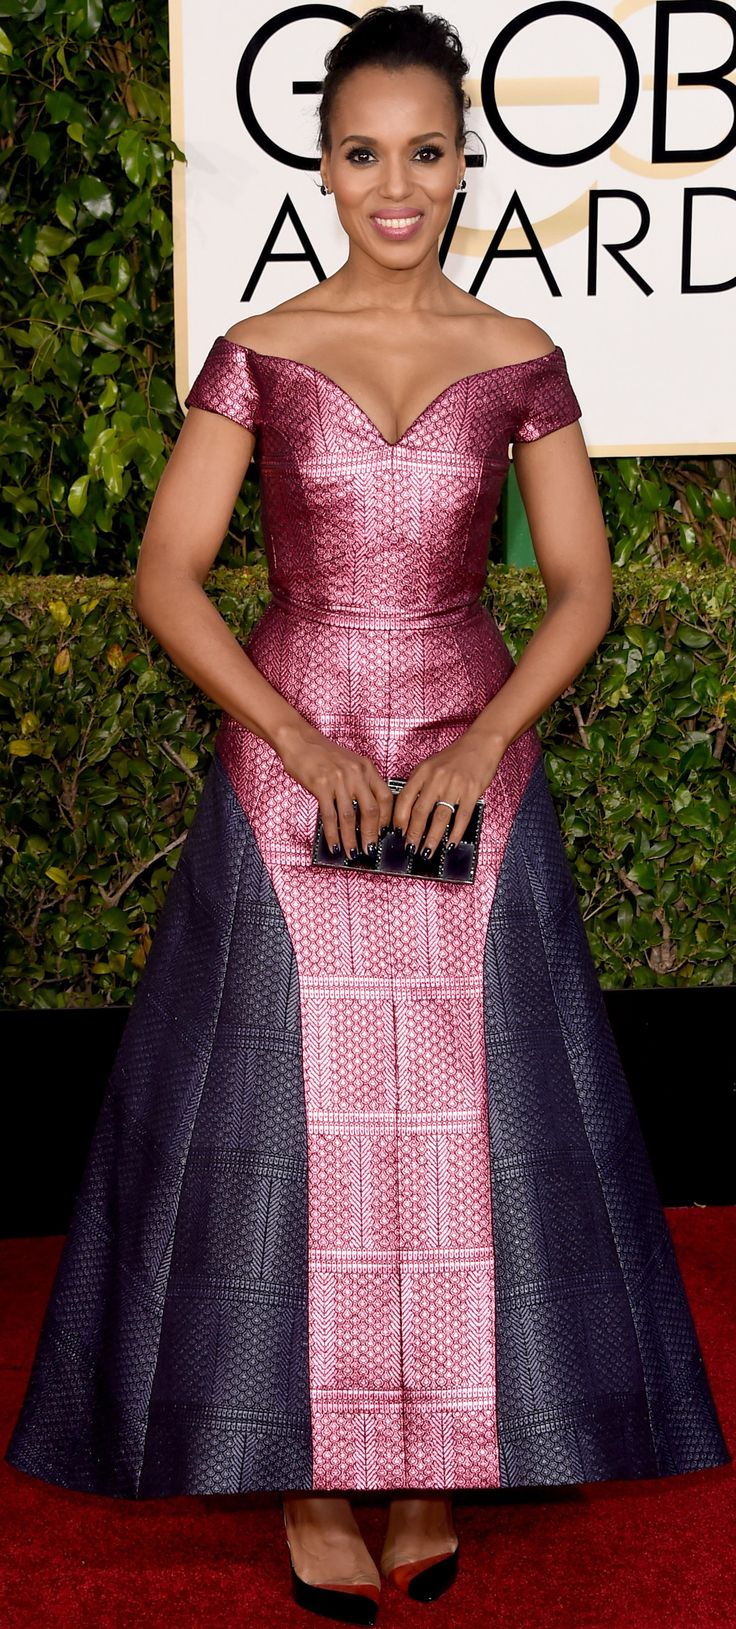 Kerry Washington - 72nd annual Golden Globe Awards, arrivals (January 11)